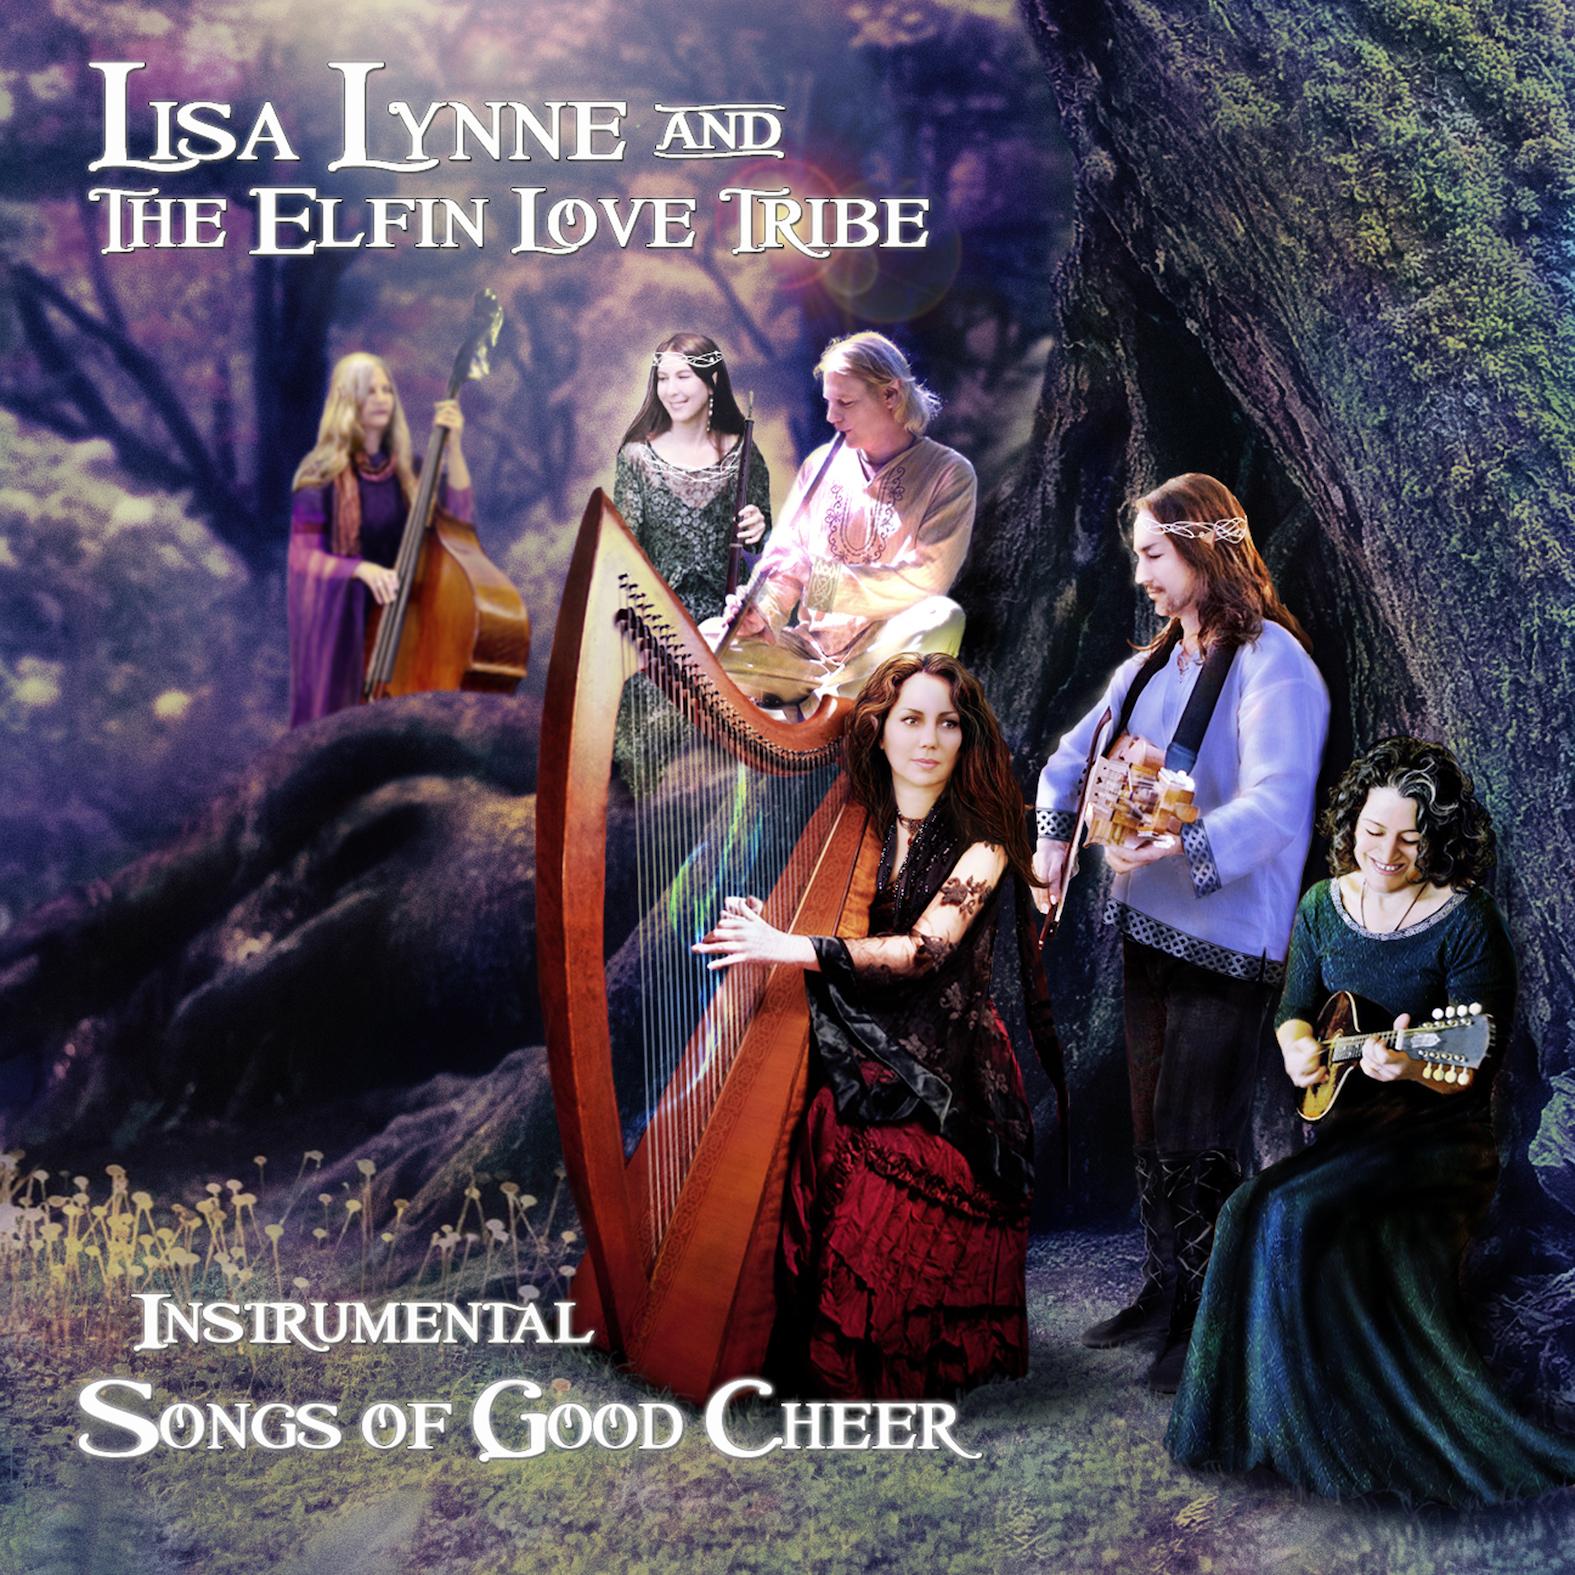 lisa lynne and the elfin love tribe instrumental songs of good cheer lisa lynne. Black Bedroom Furniture Sets. Home Design Ideas